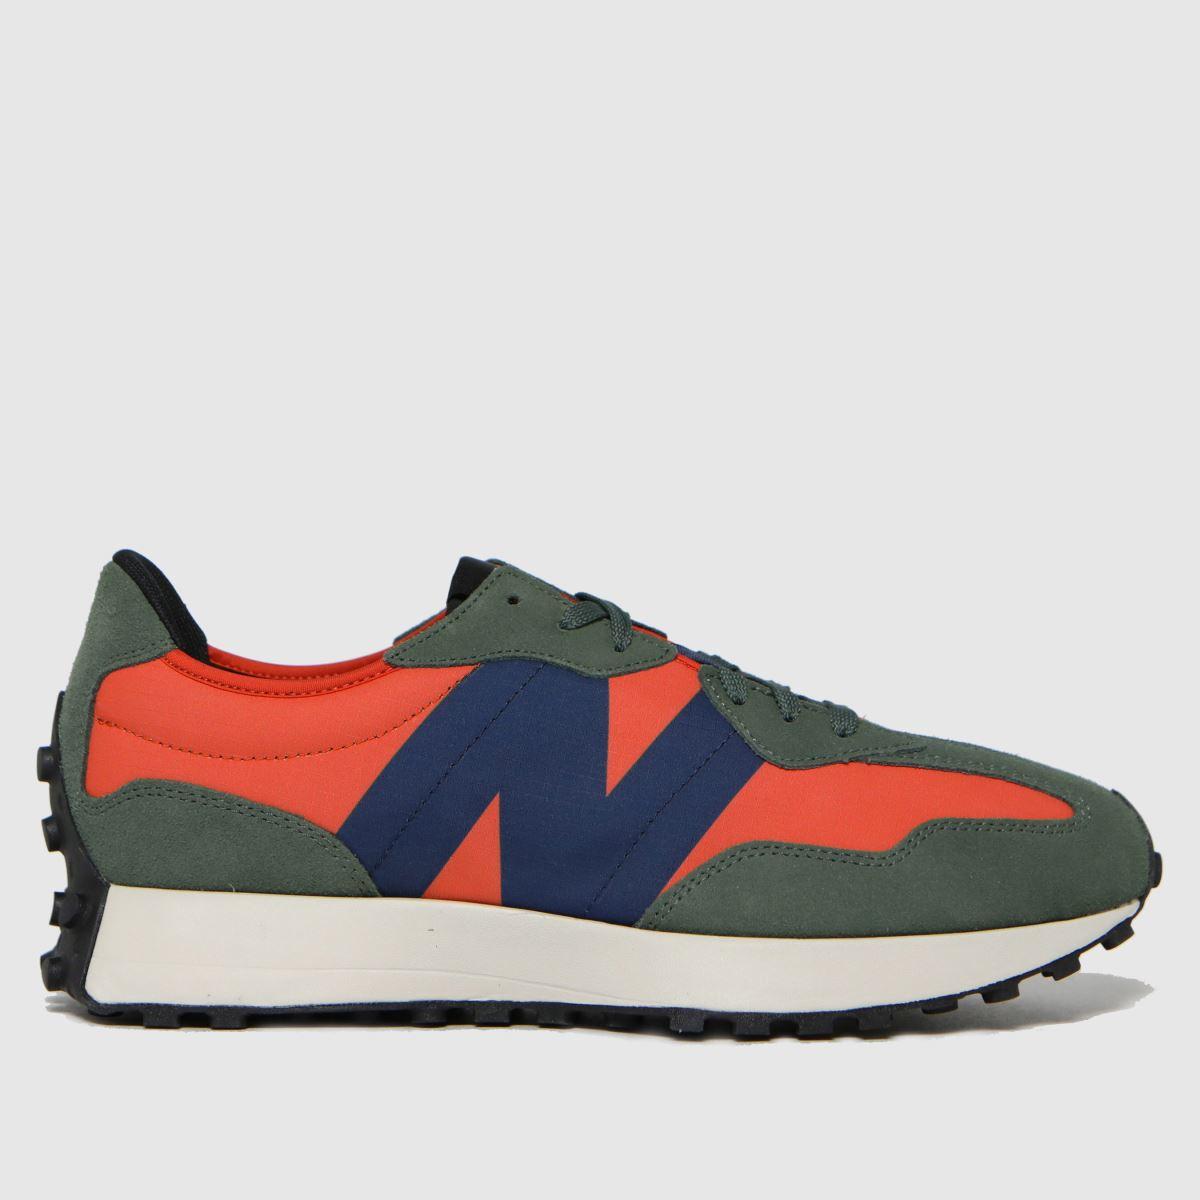 New Balance Orange 327 Trainers